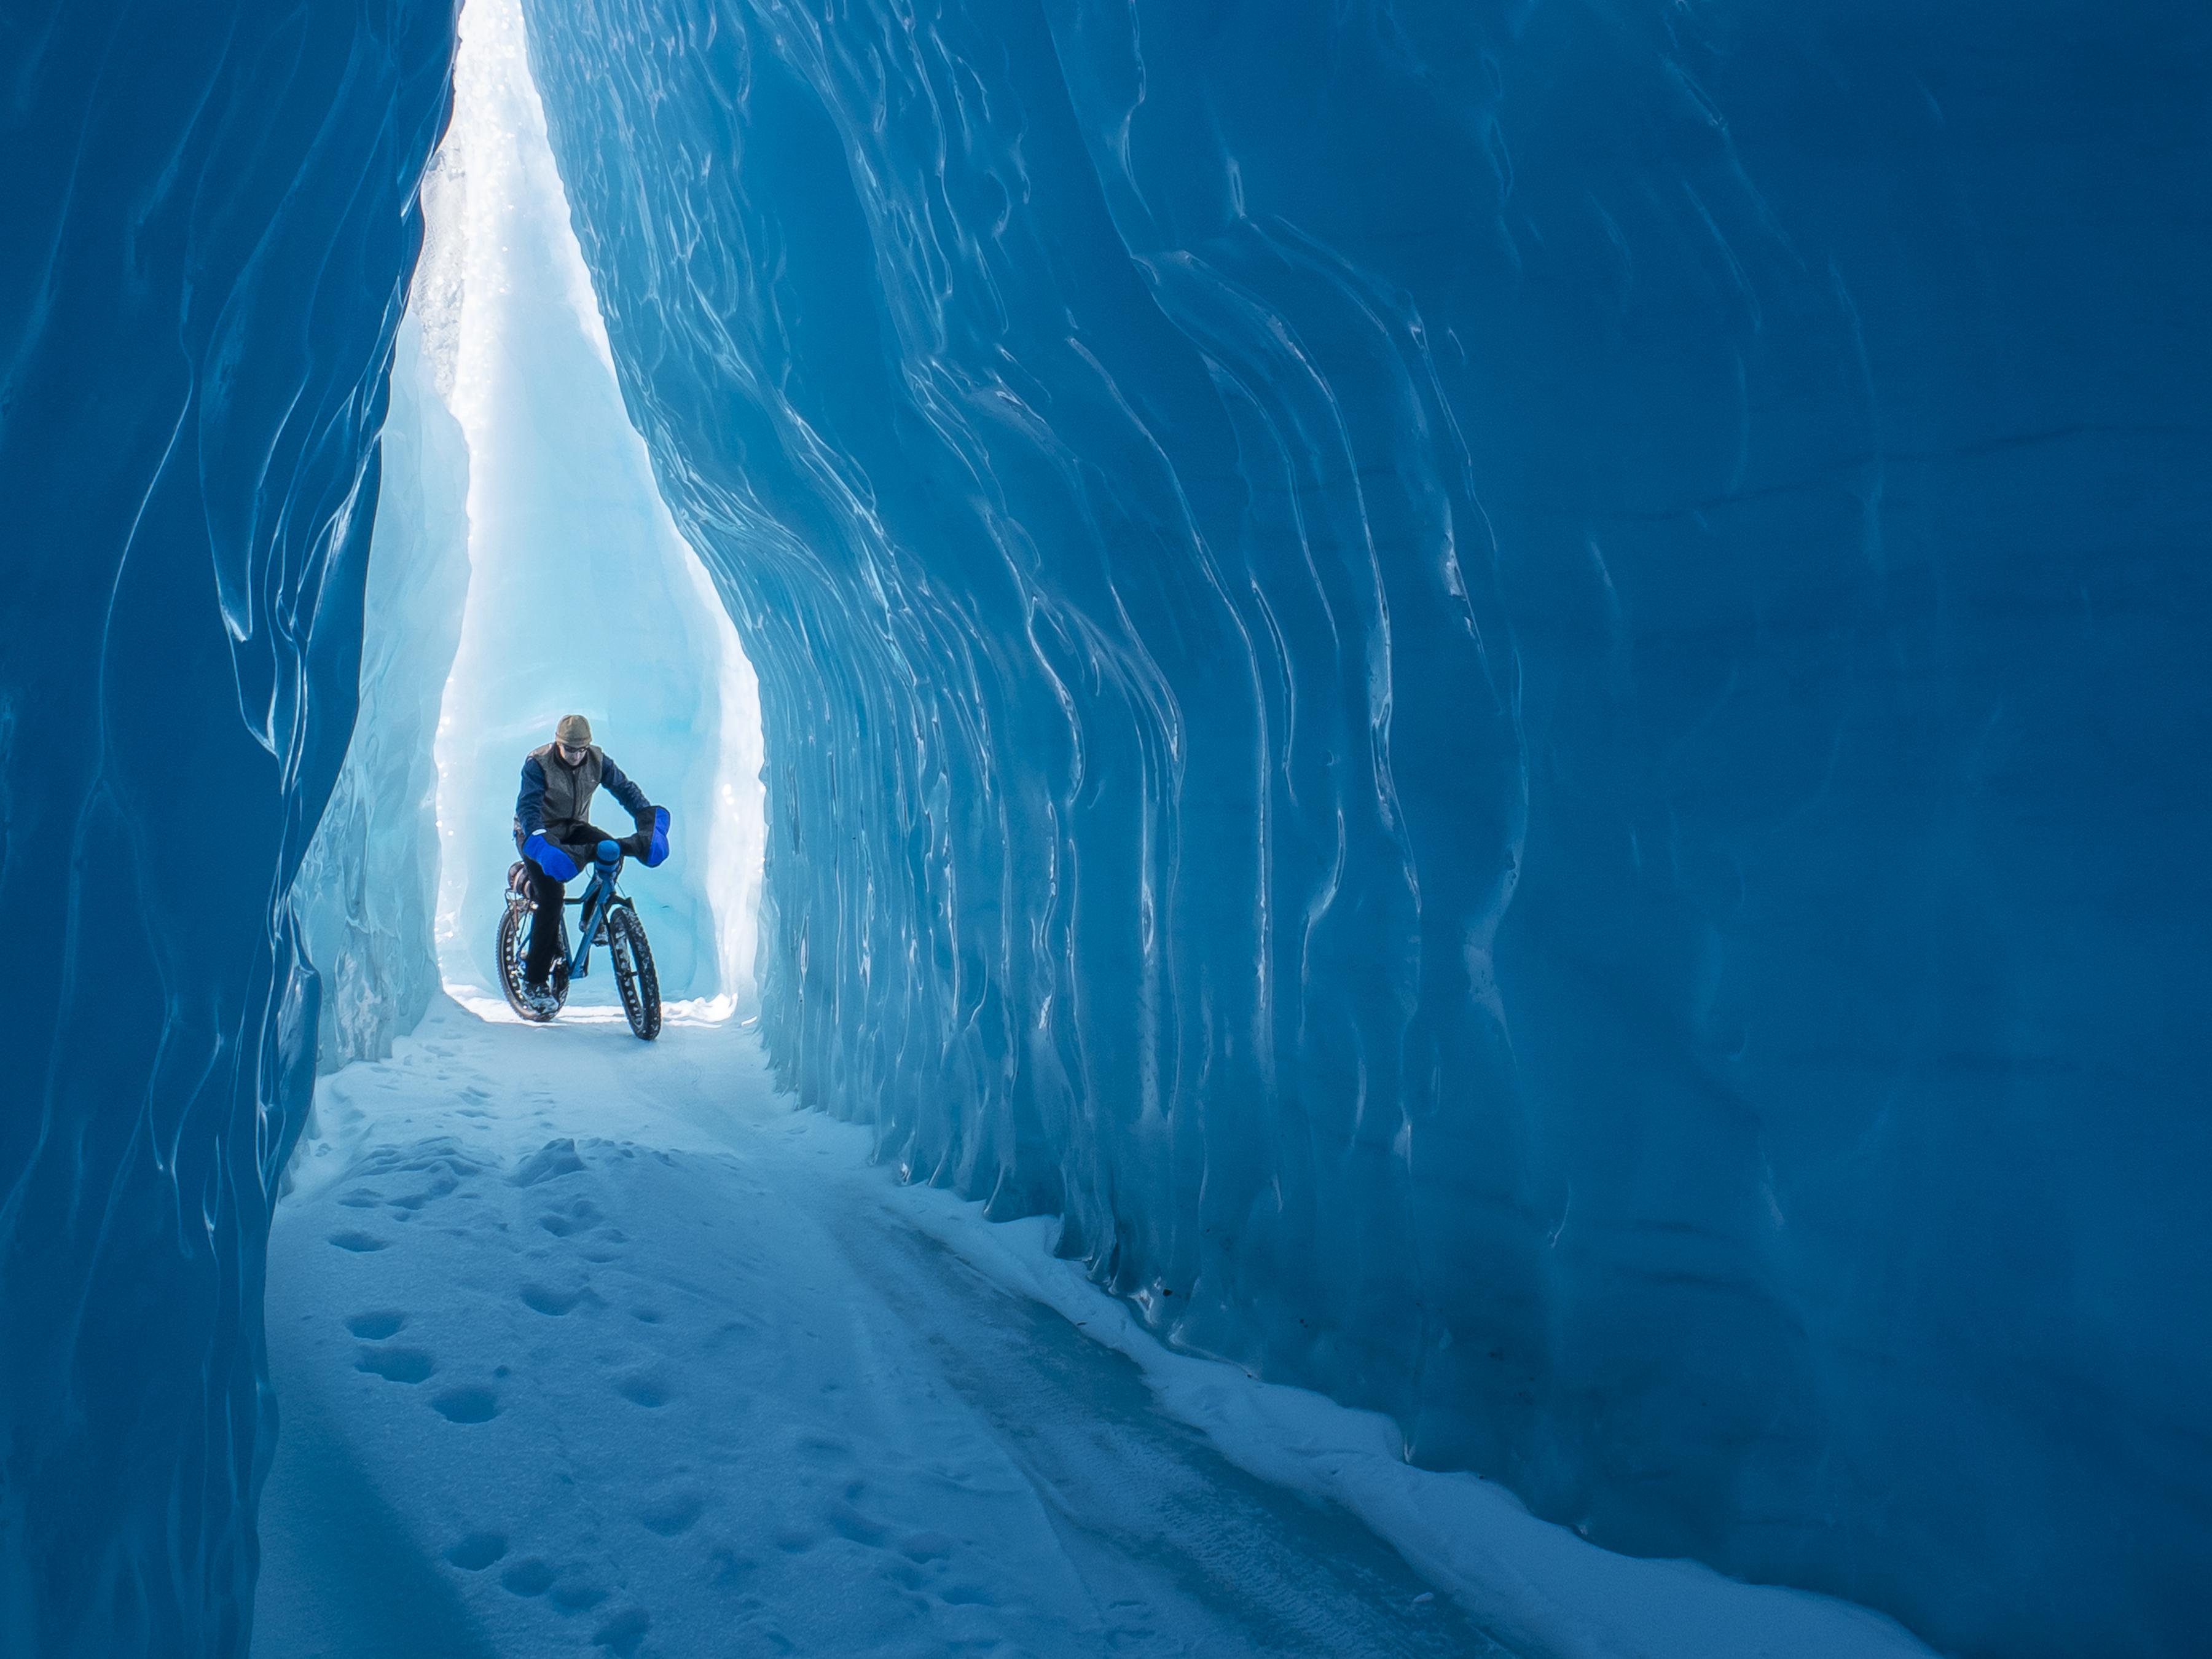 Best Bike Lock Outdoors The Alaska Range Project